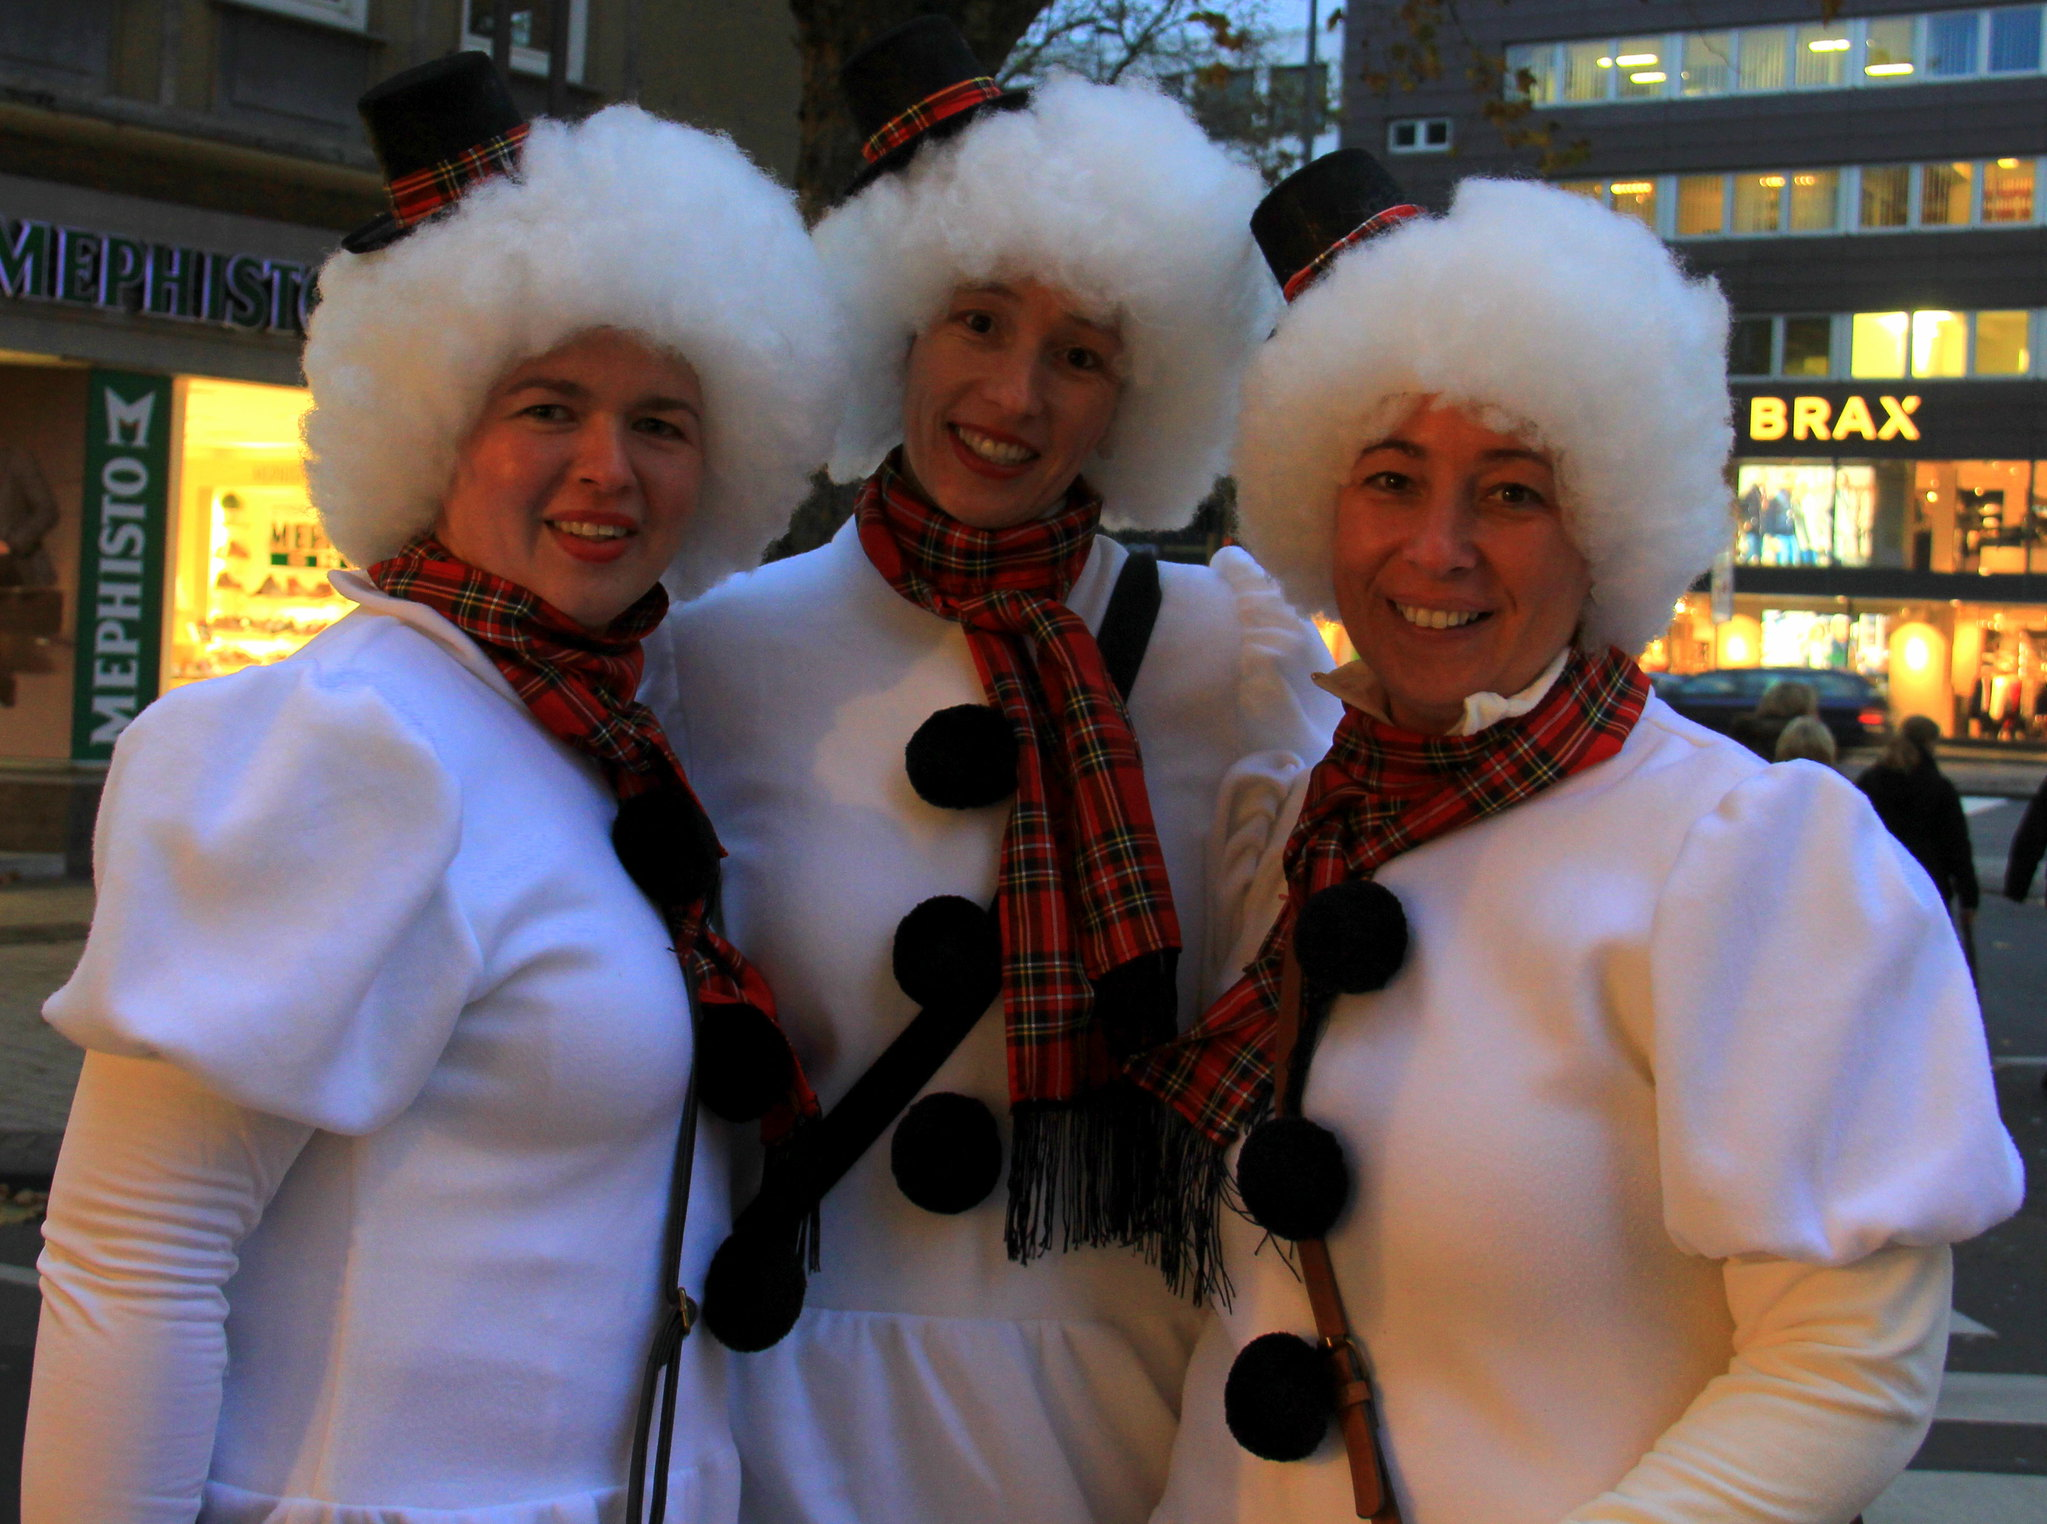 Beautiful costumes at cologne carnival